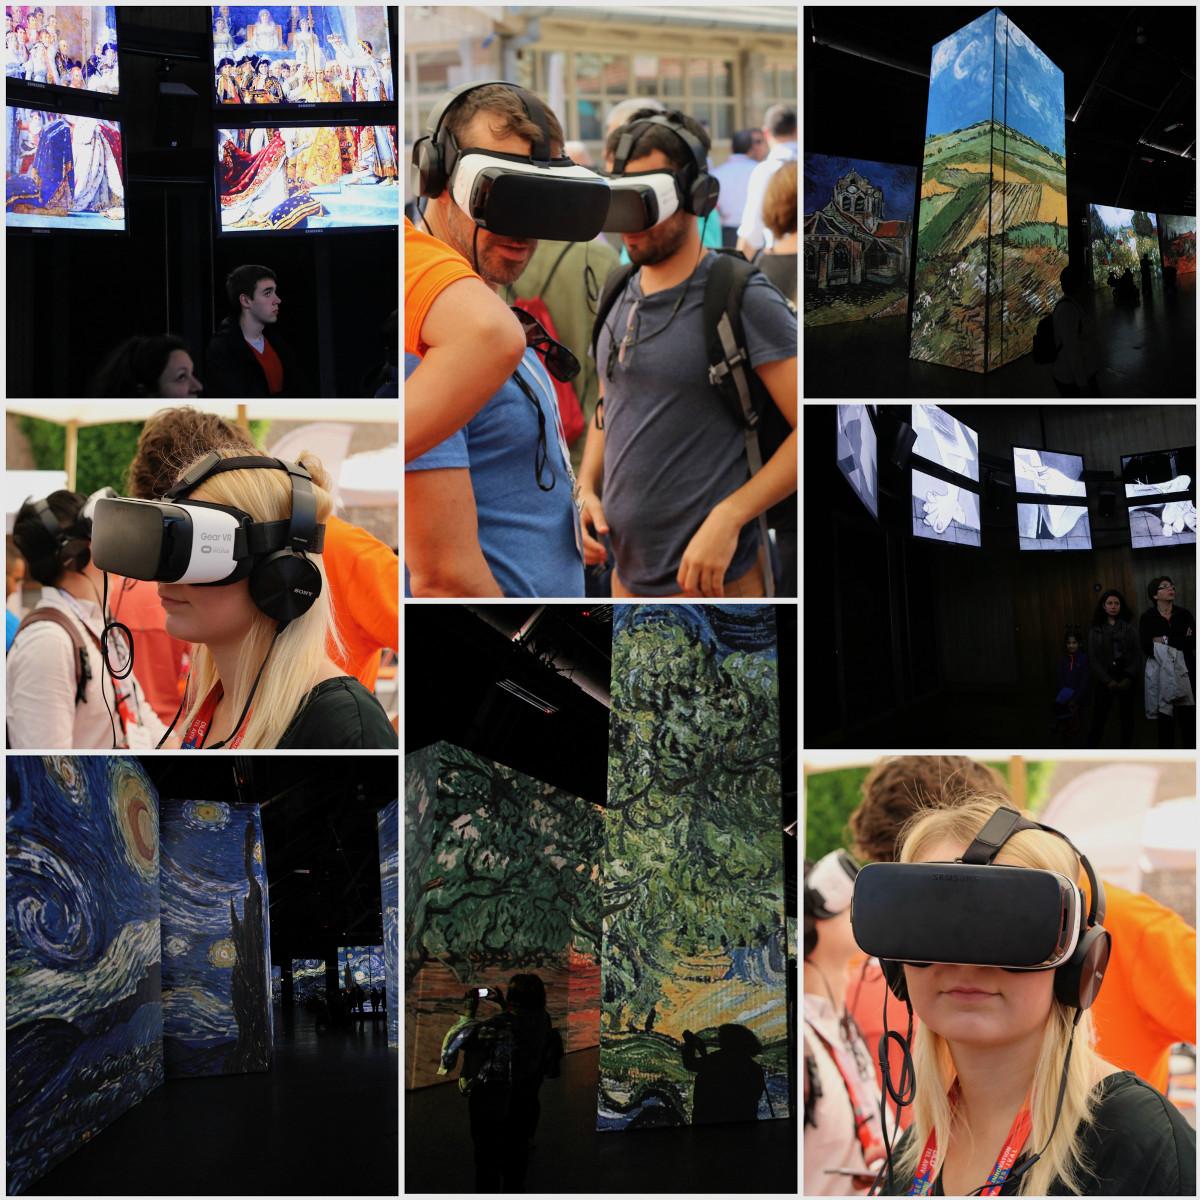 Virtual reality immersive exhibition